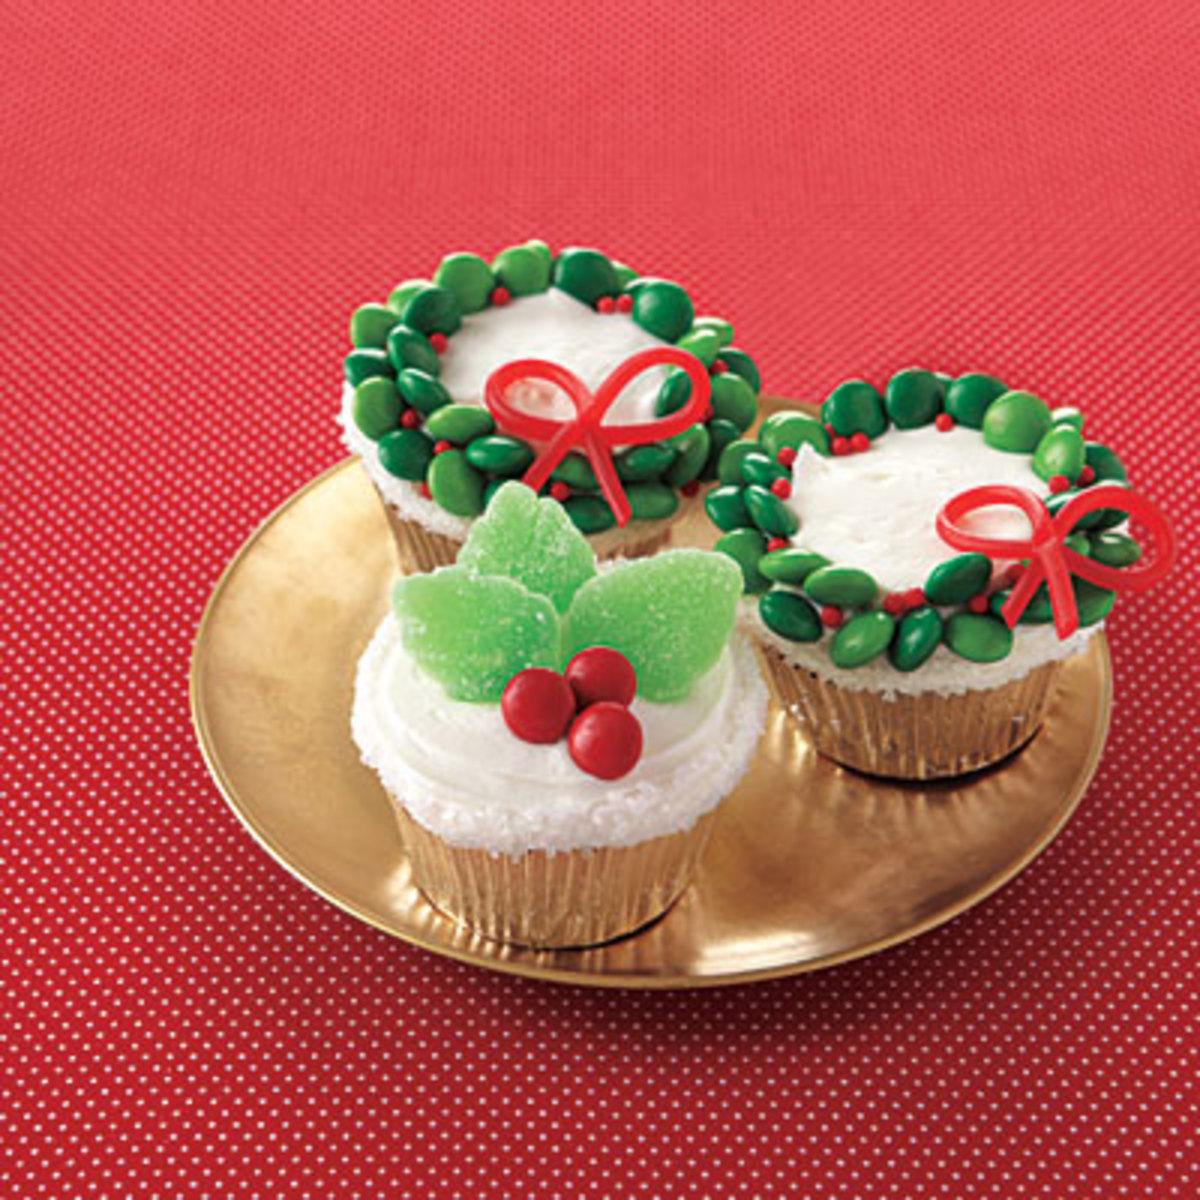 Orange Cupcakes with Homemade Vanilla Frosting